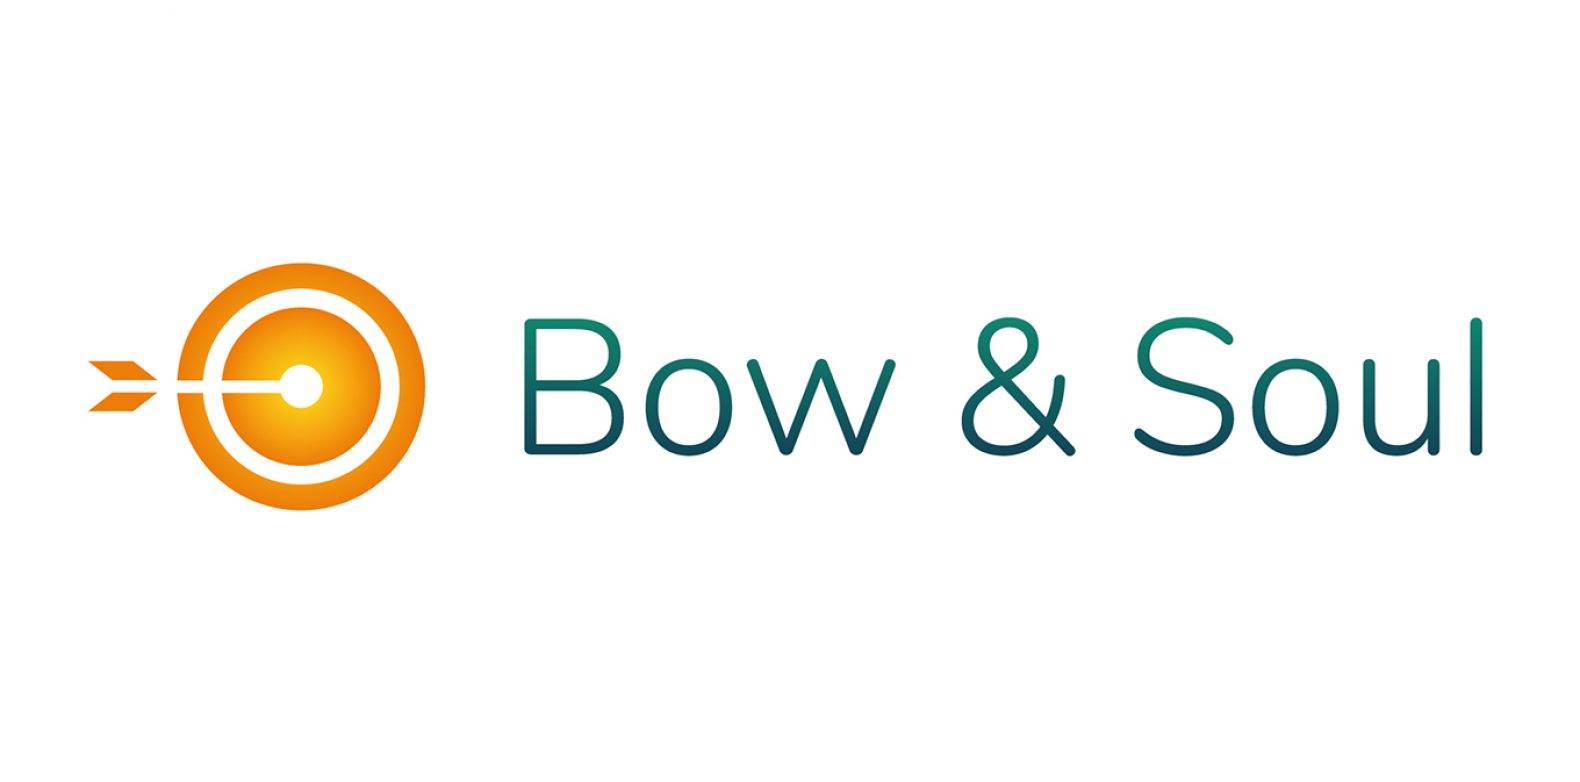 Bow & Soul